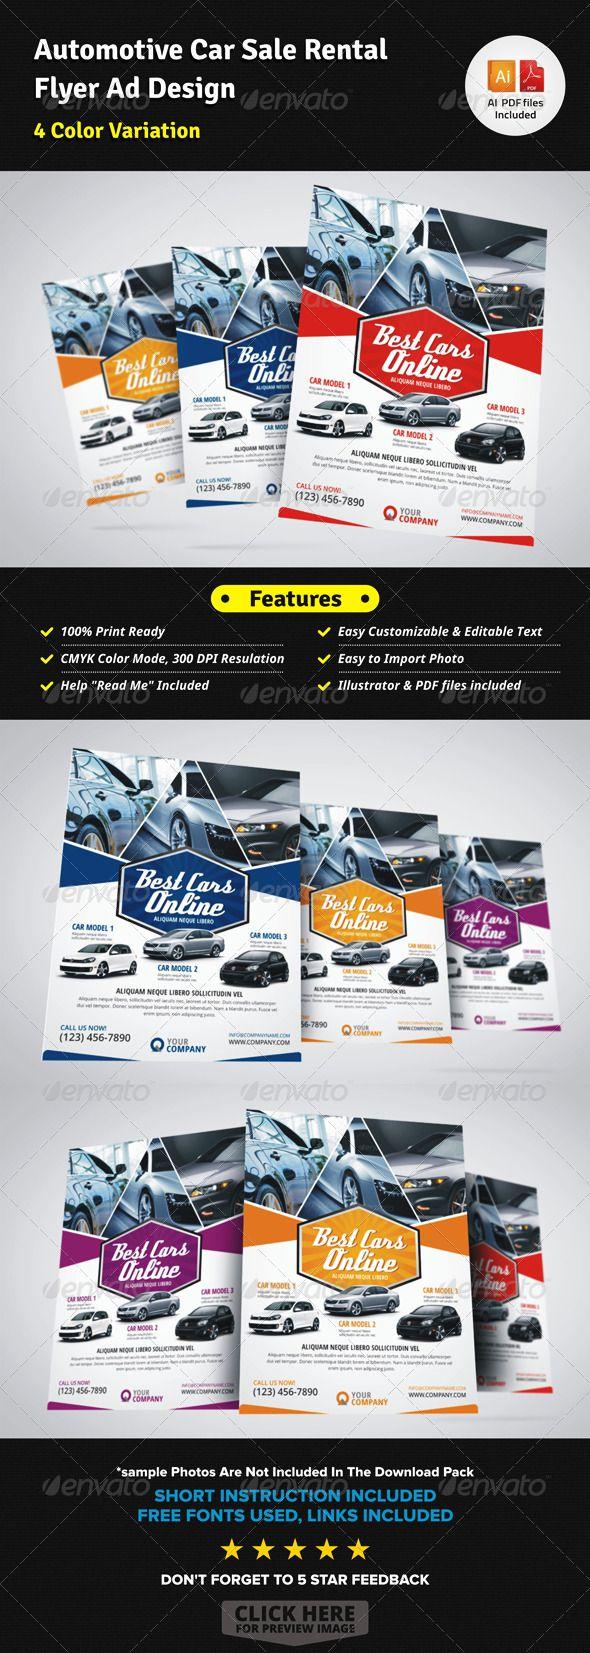 Automotive Car Sale Rental Flyer Ad Template GraphicRiver